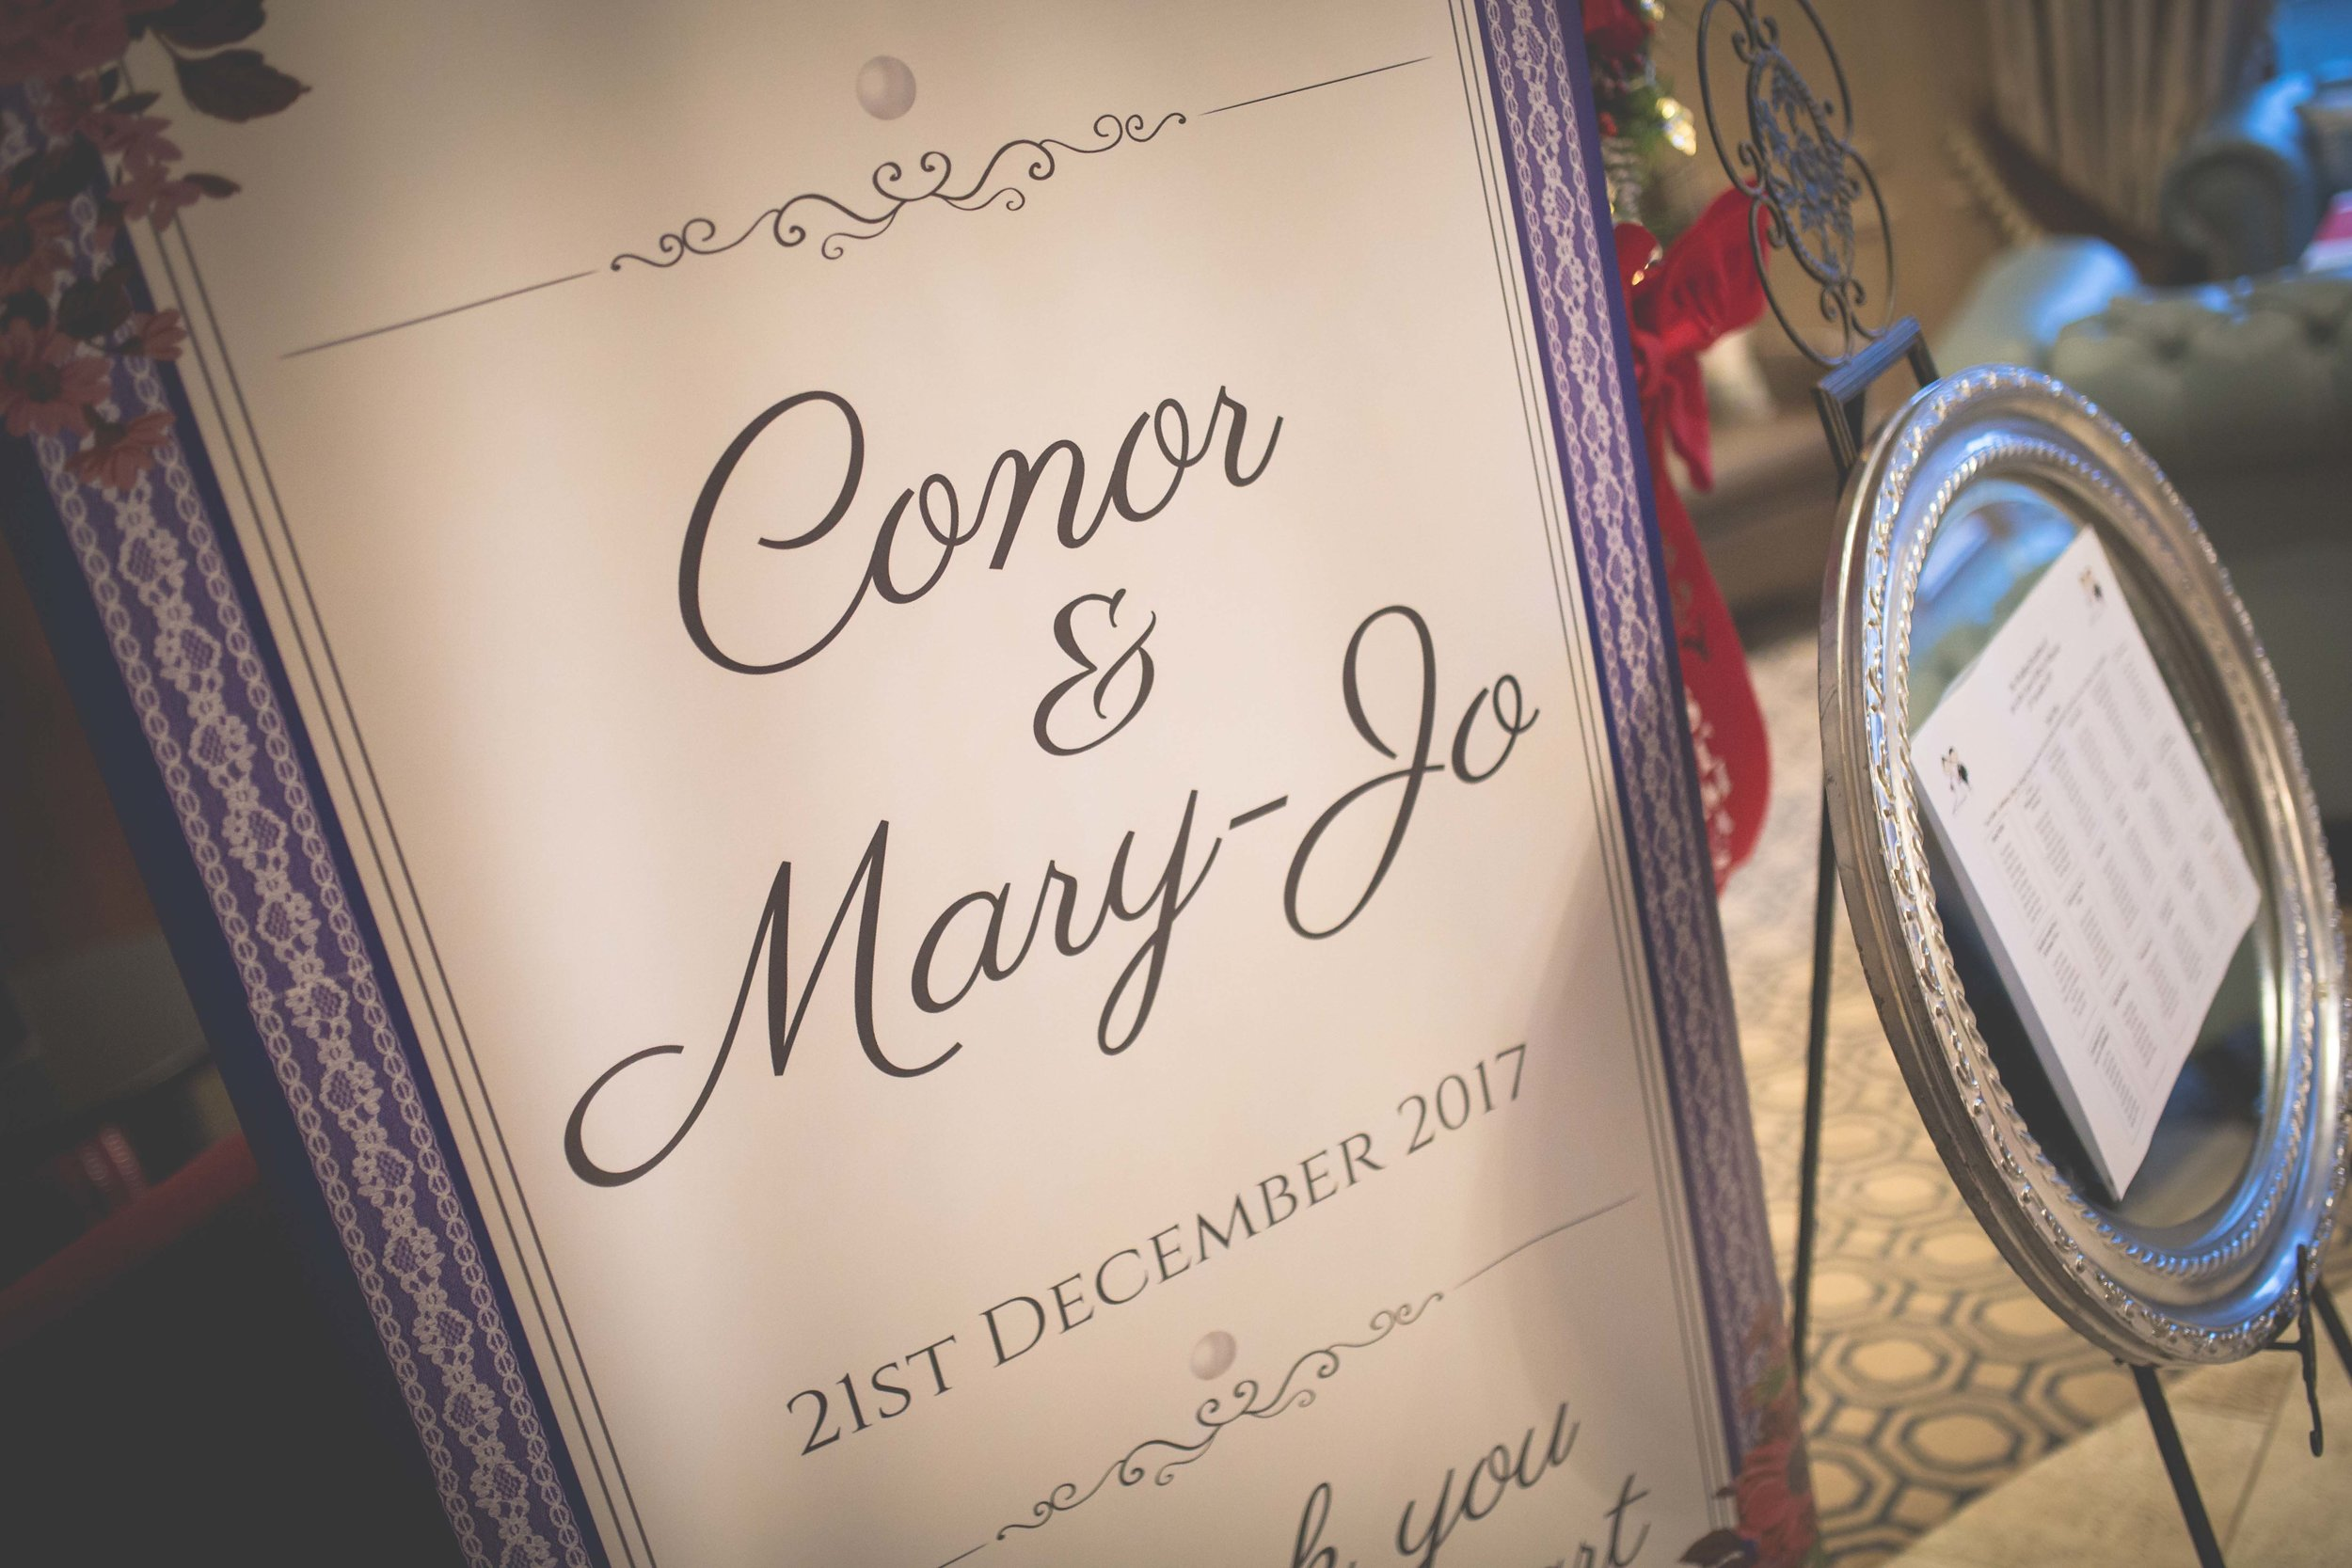 MaryJo_Conor_Mageean_Reception-15.jpg